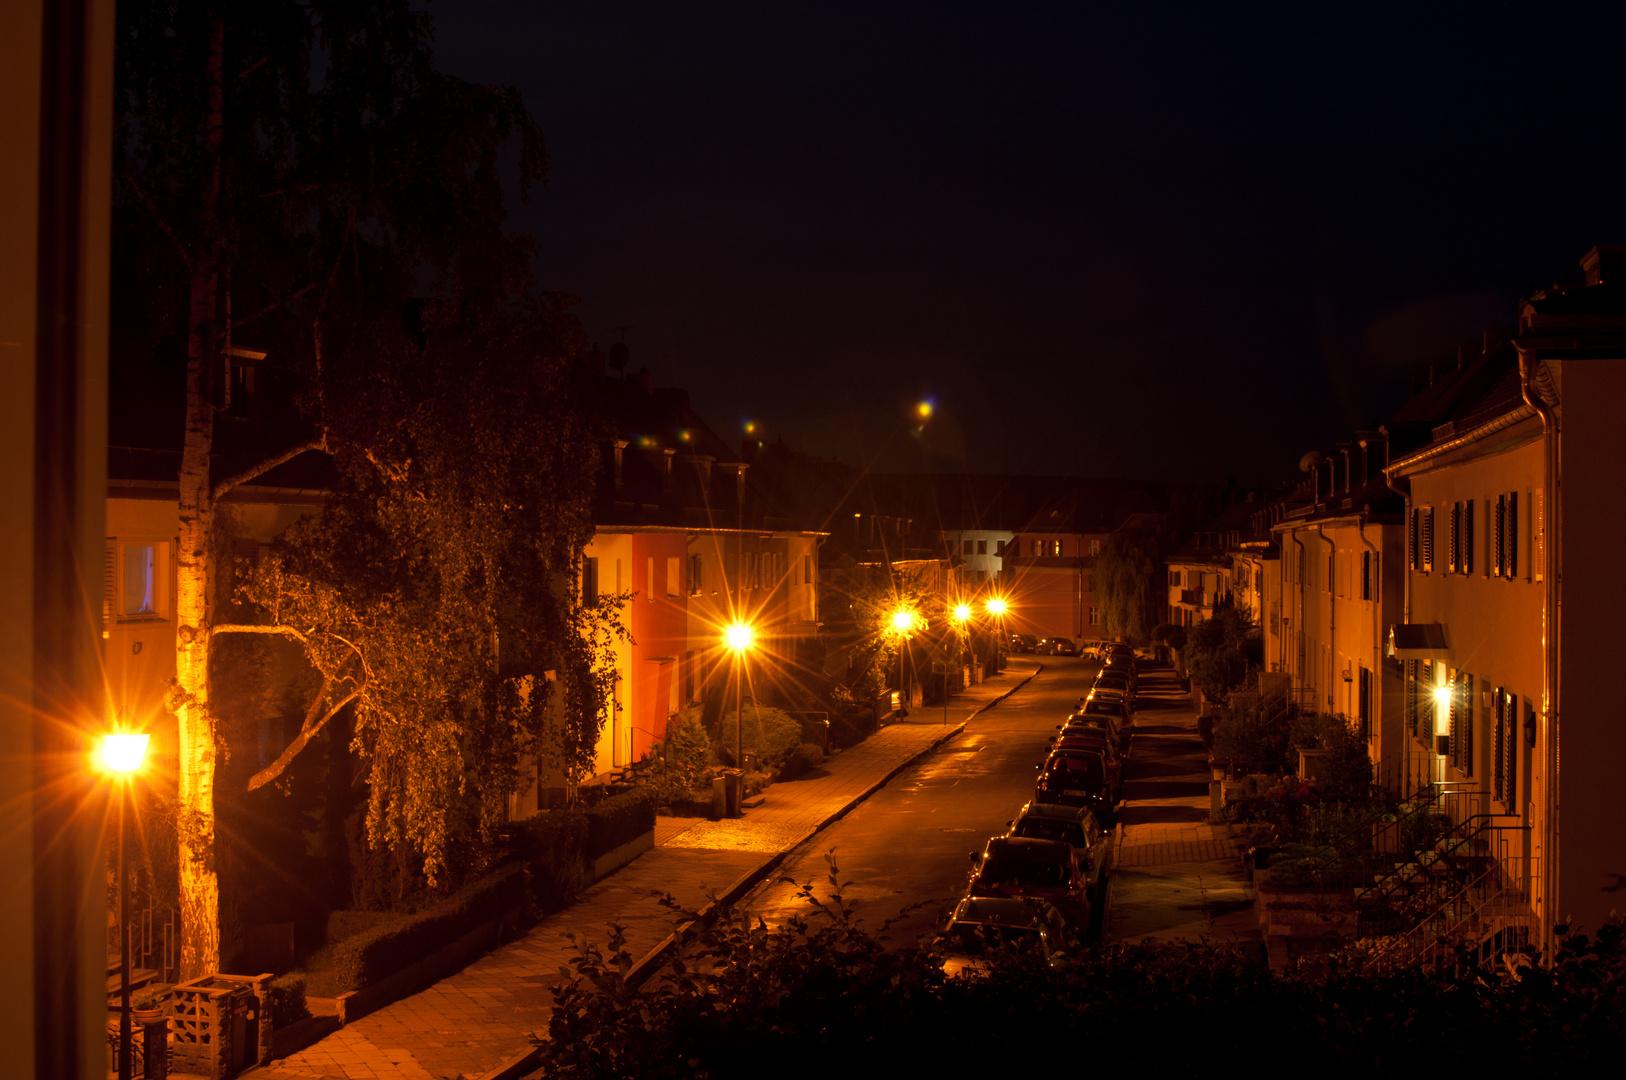 Nachts irgendwo in Weimar